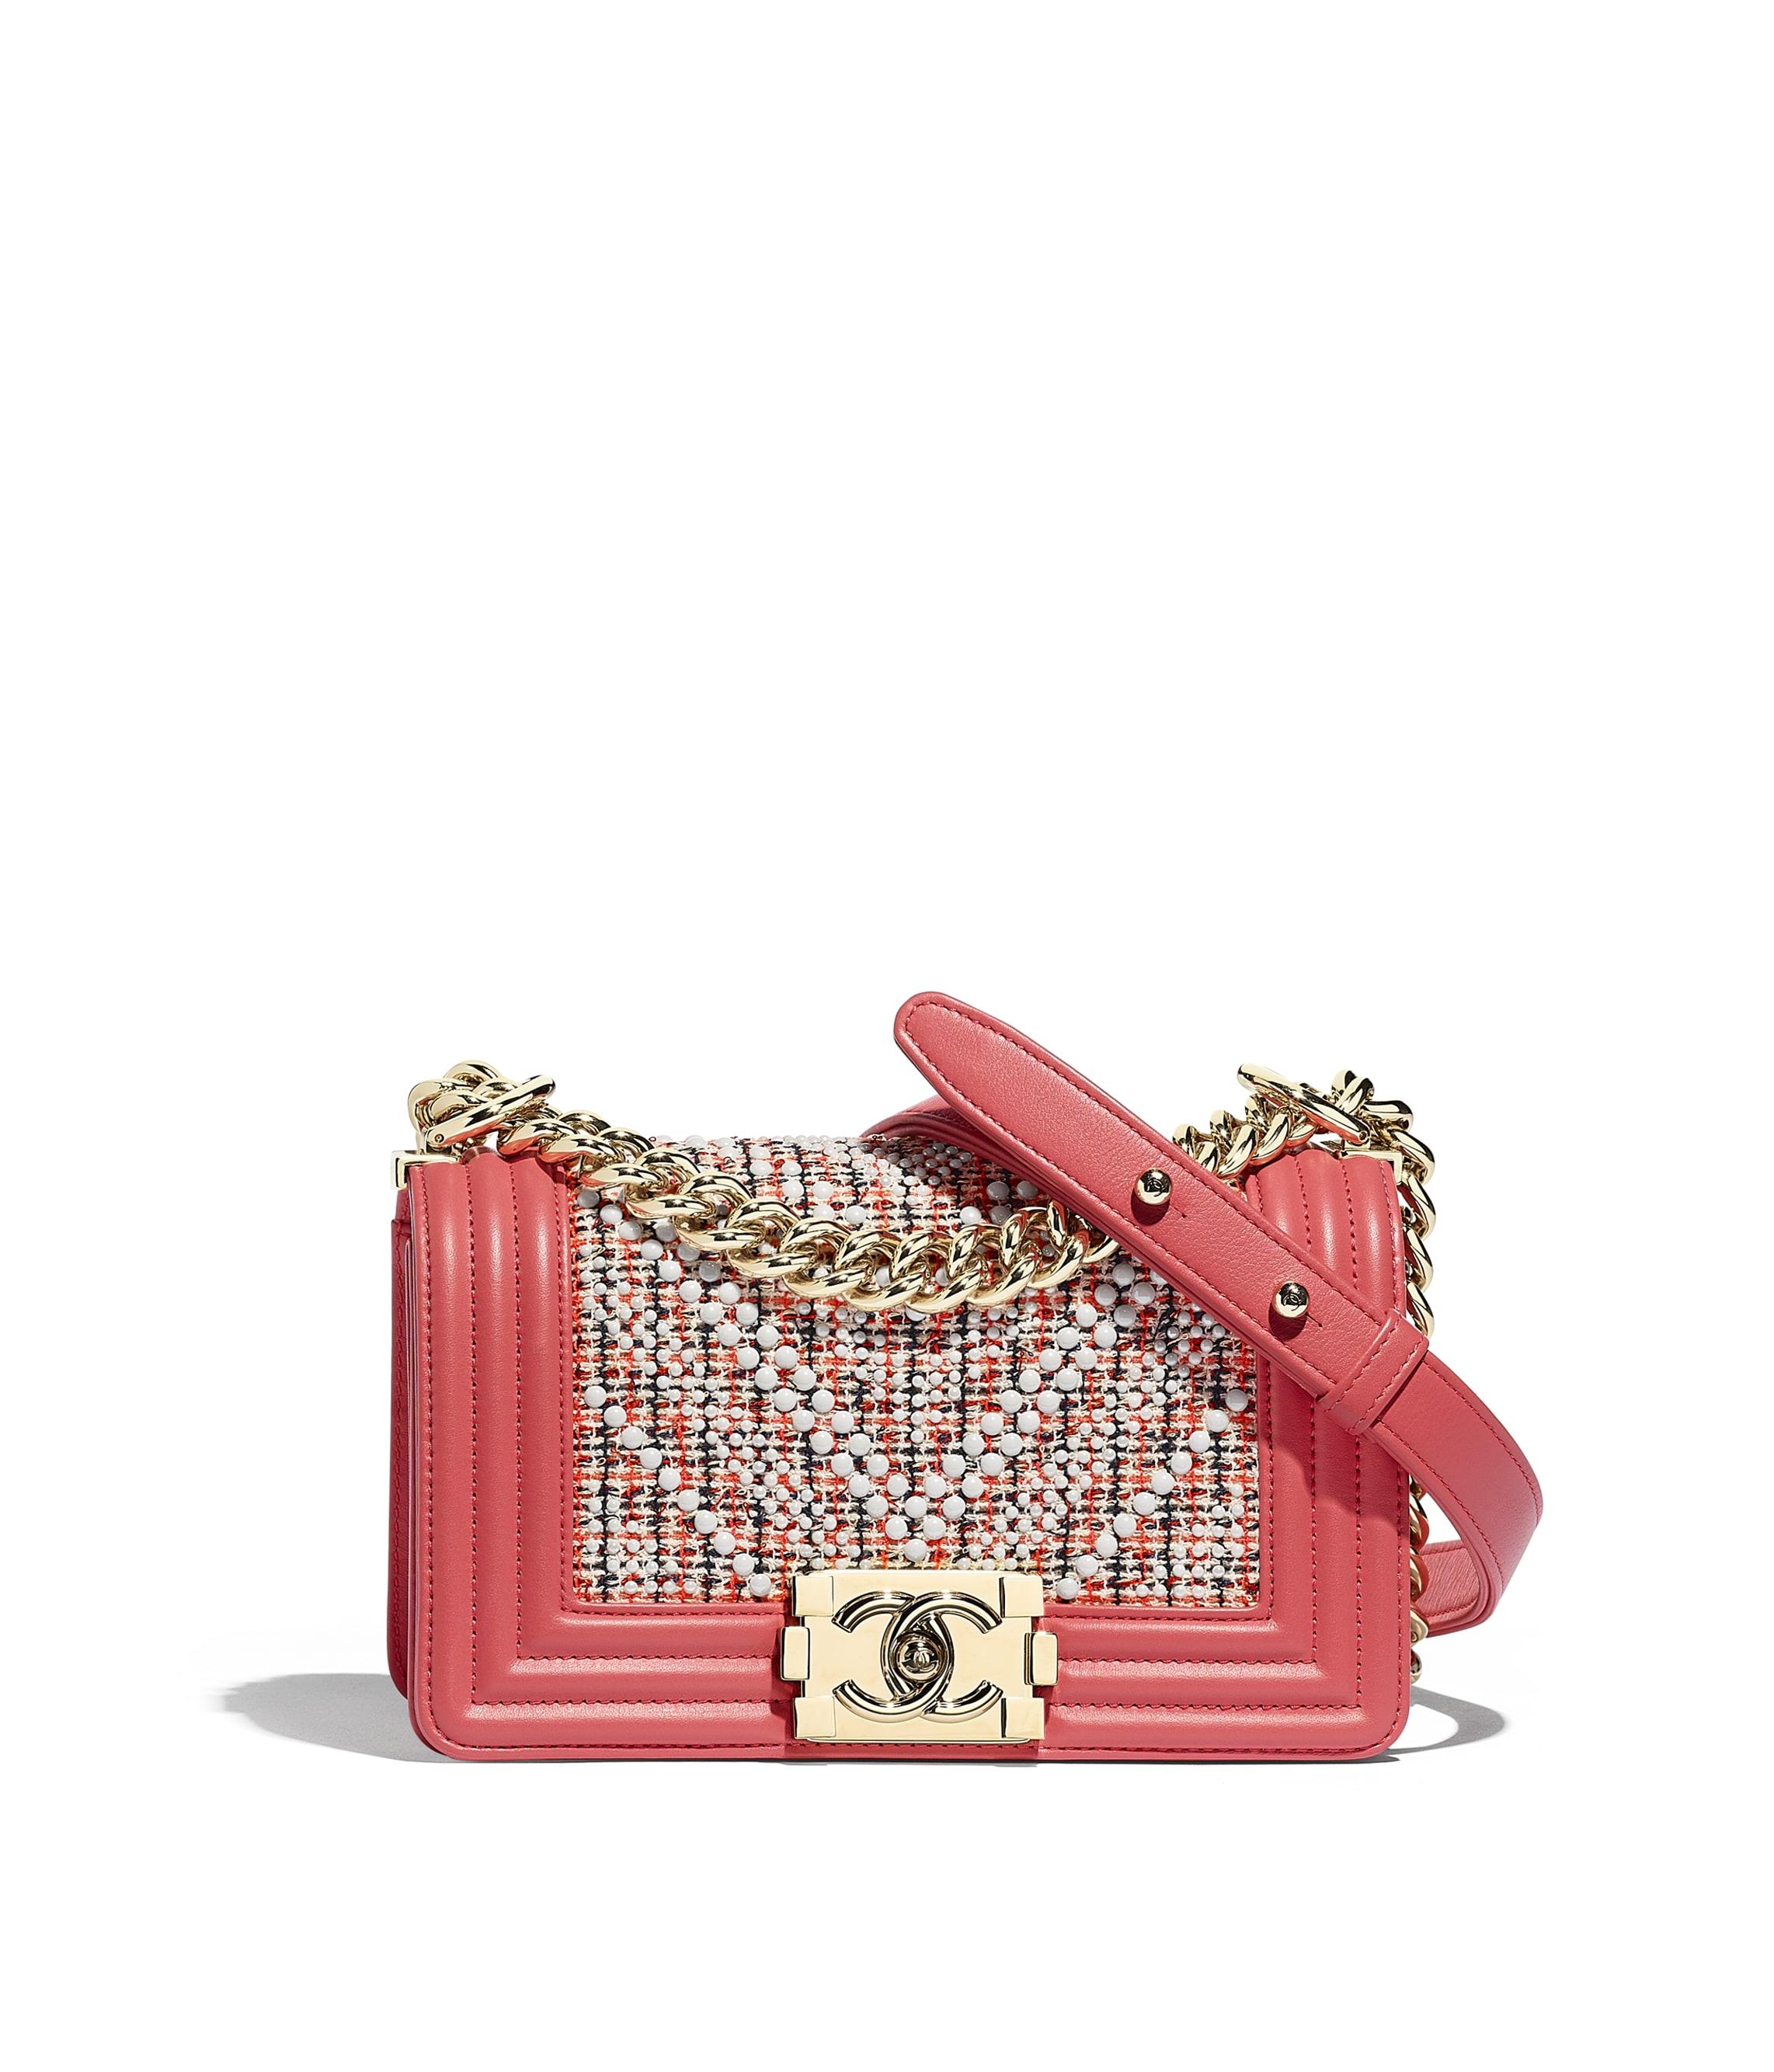 1dfa28248c9728 Small BOY CHANEL Handbag, tweed, calfskin & gold-tone metal, red ...